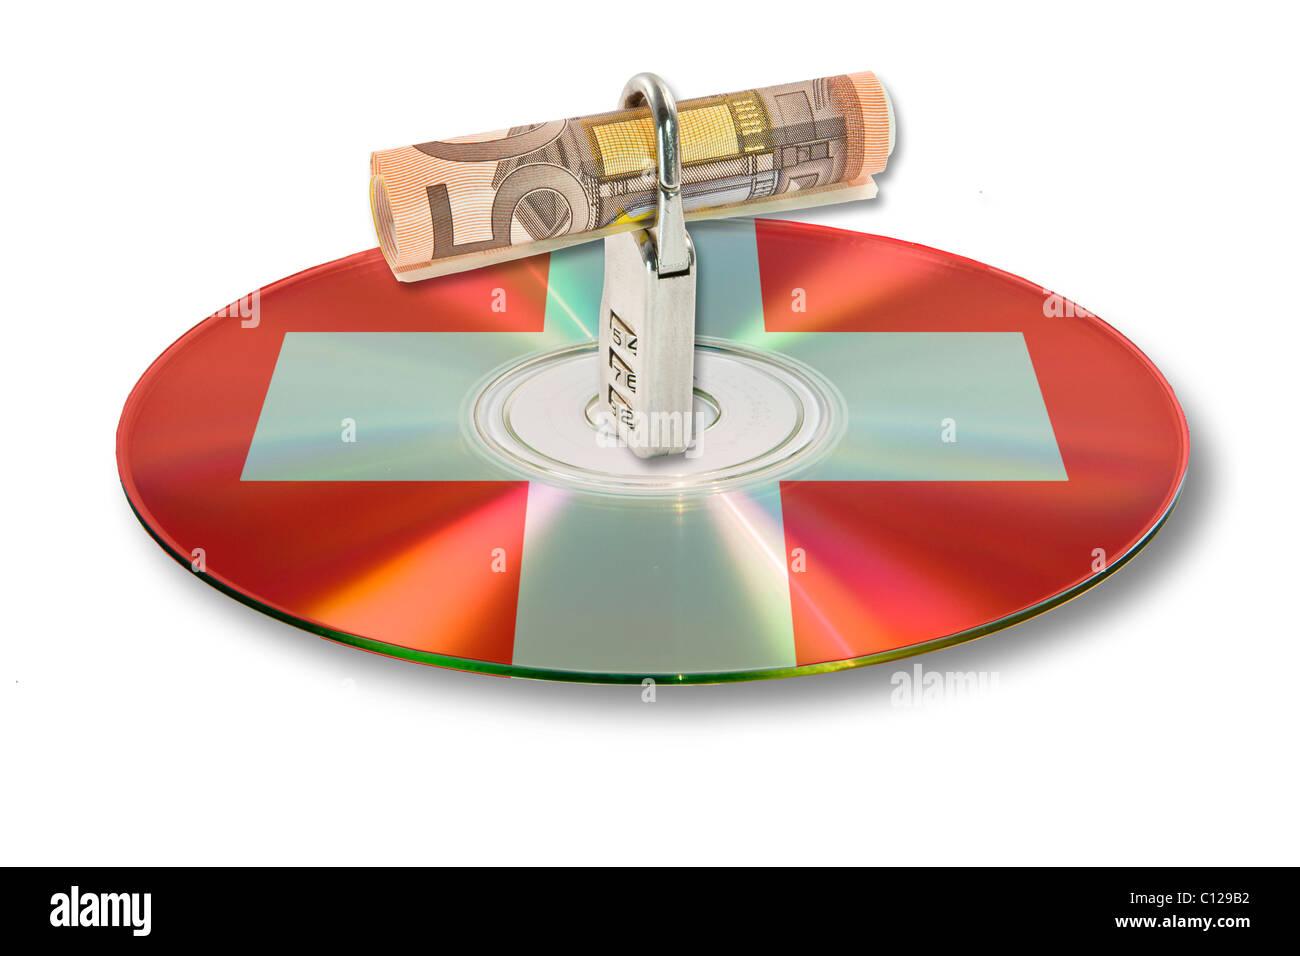 Bill, lock, data, on a CD, DVD, Switzerland, account data - Stock Image